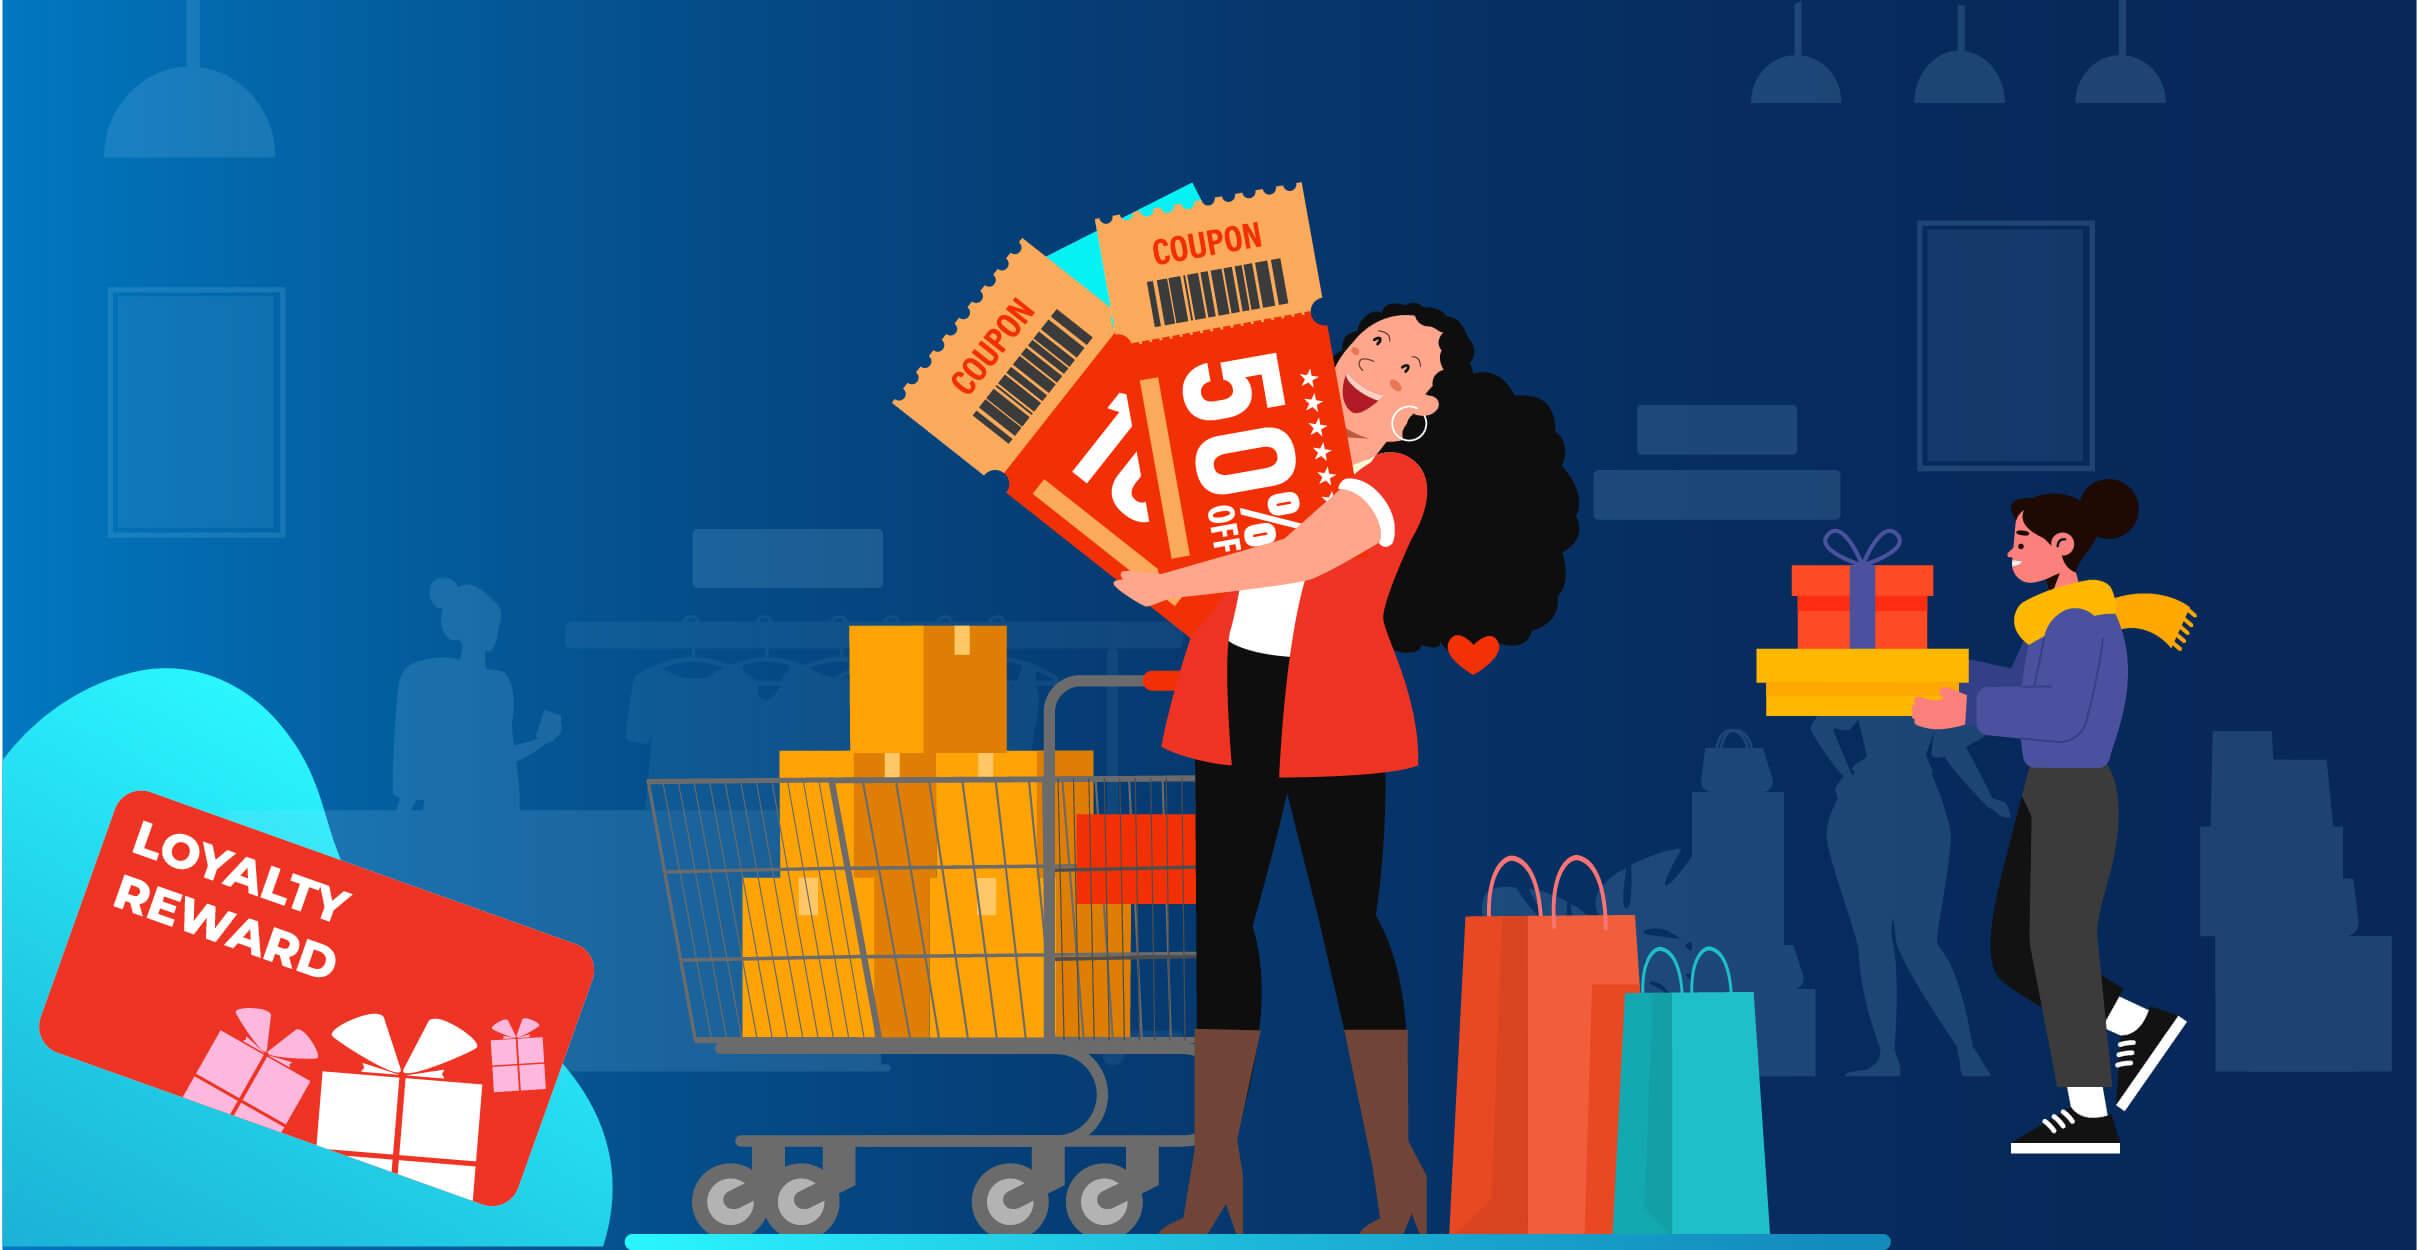 Ftx loyalty program for b2b customers